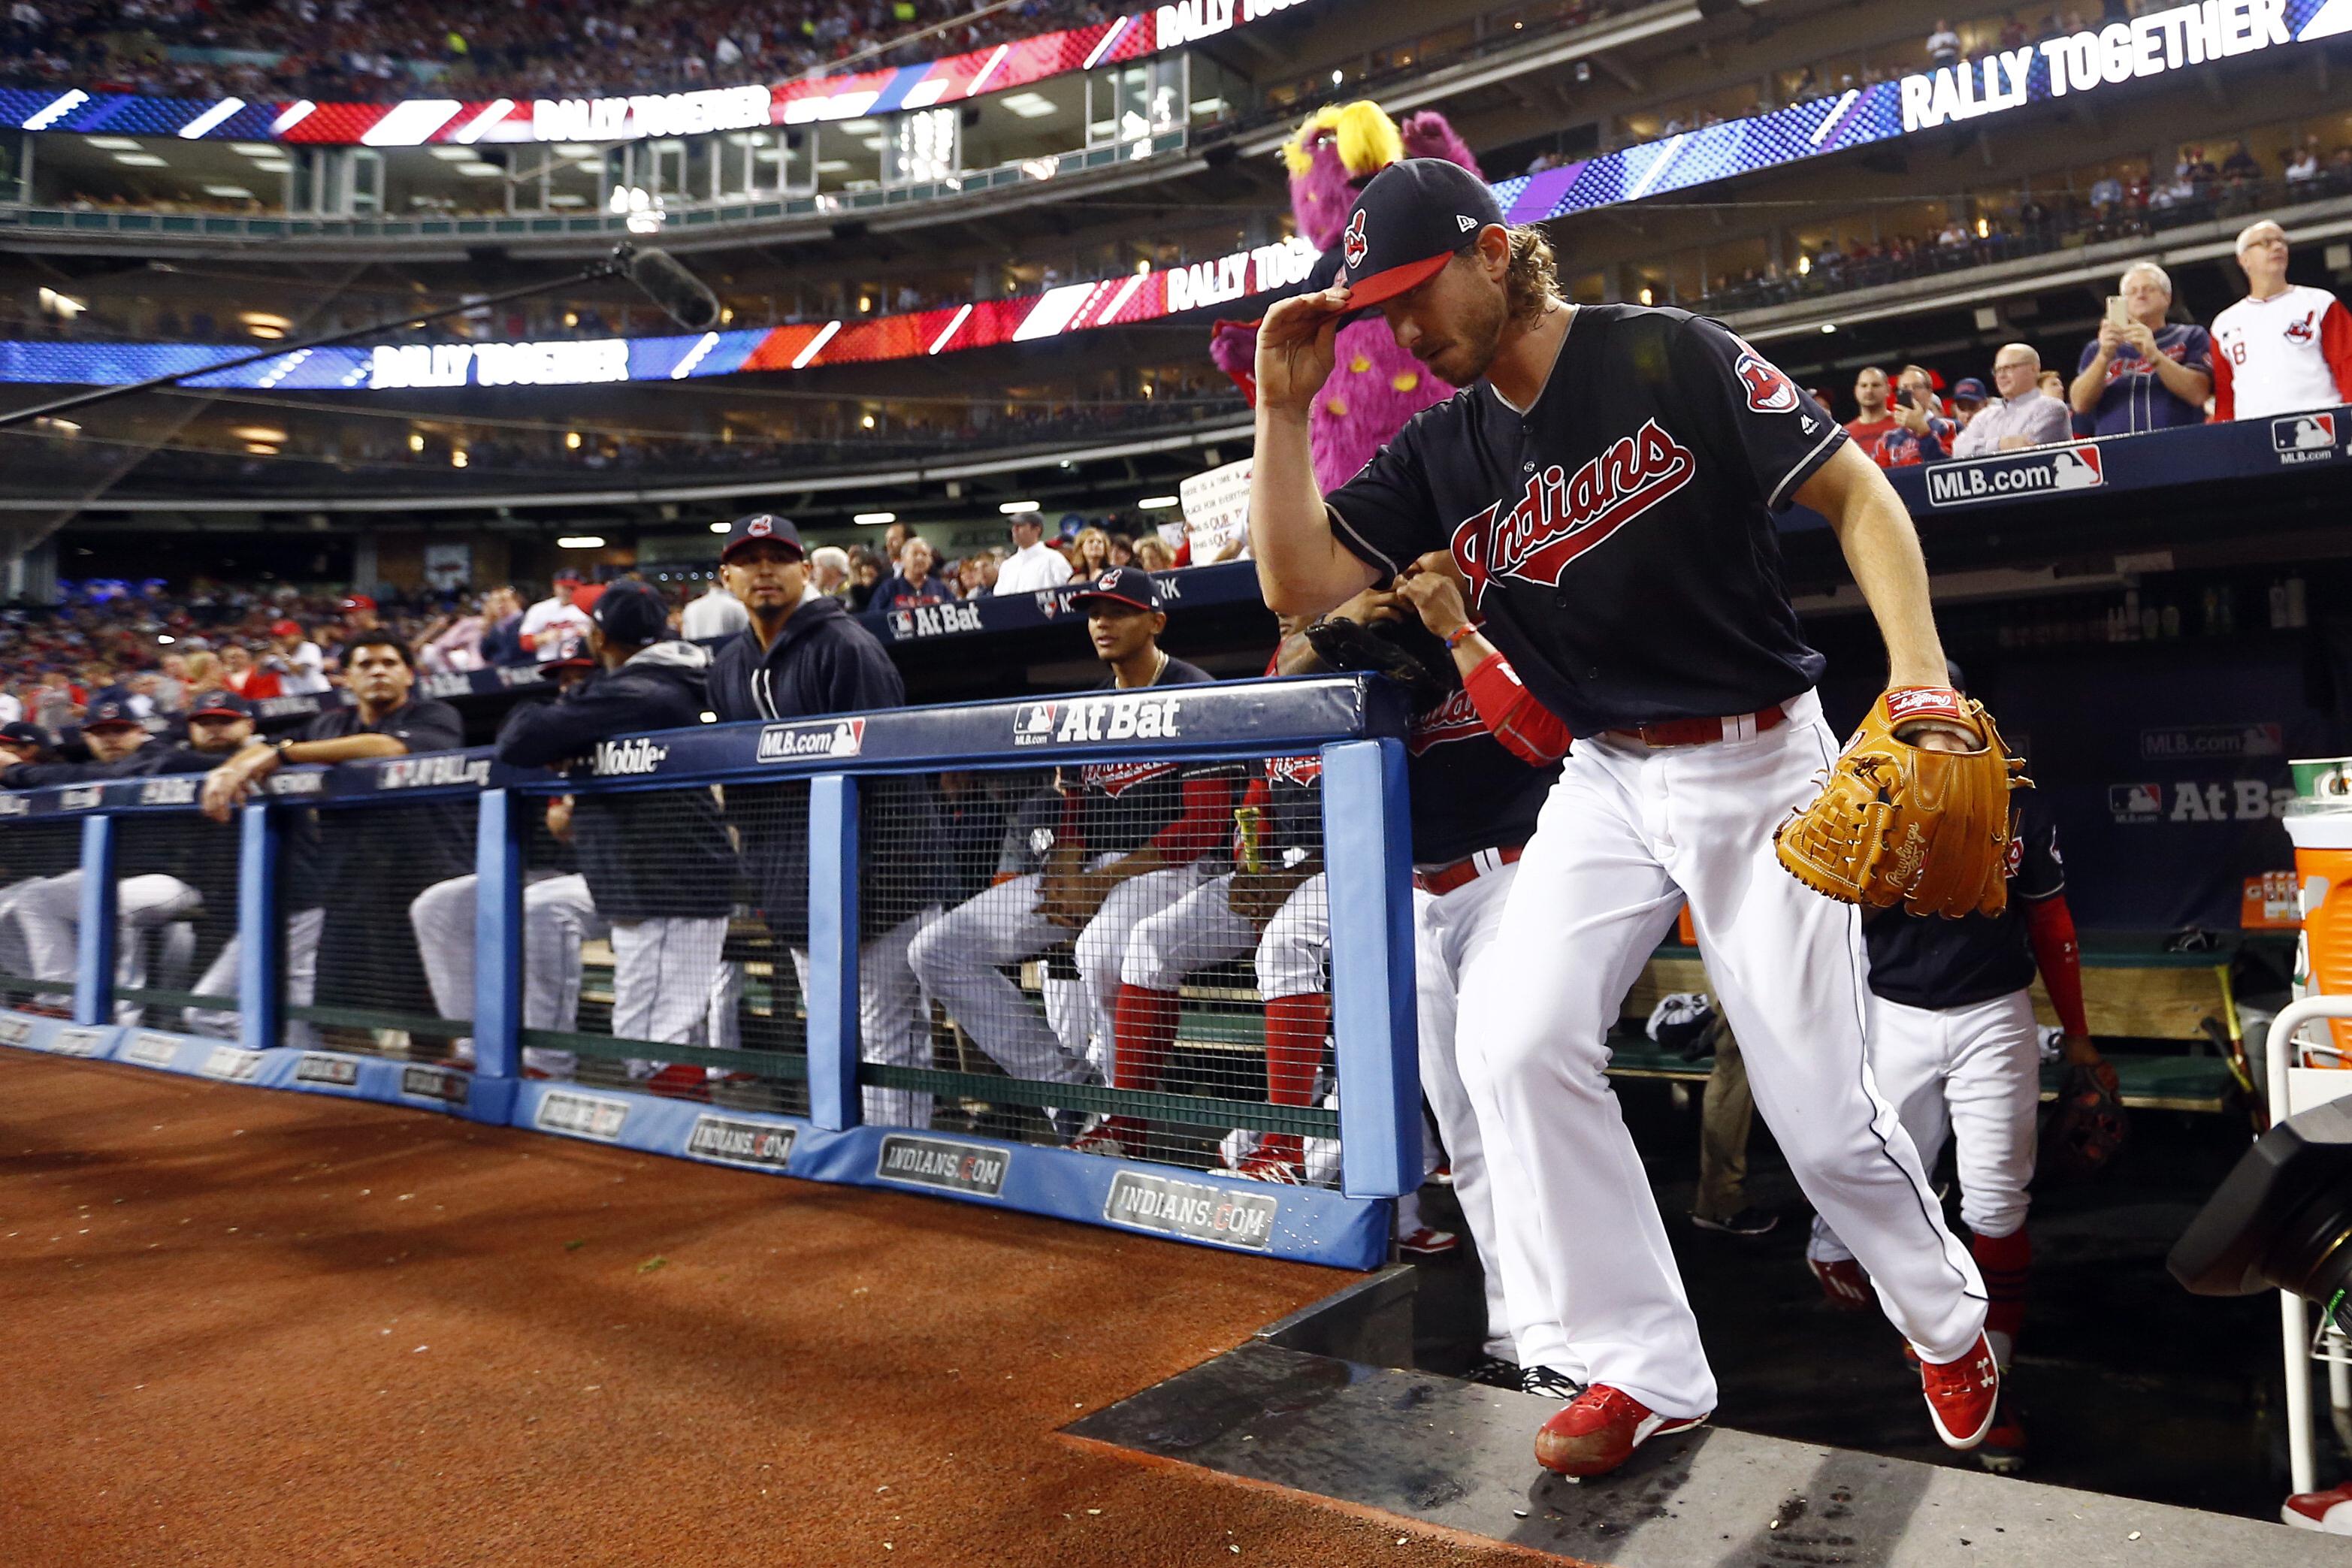 2016 World Series - Chicago Cubs v. Cleveland Indians: Game 6